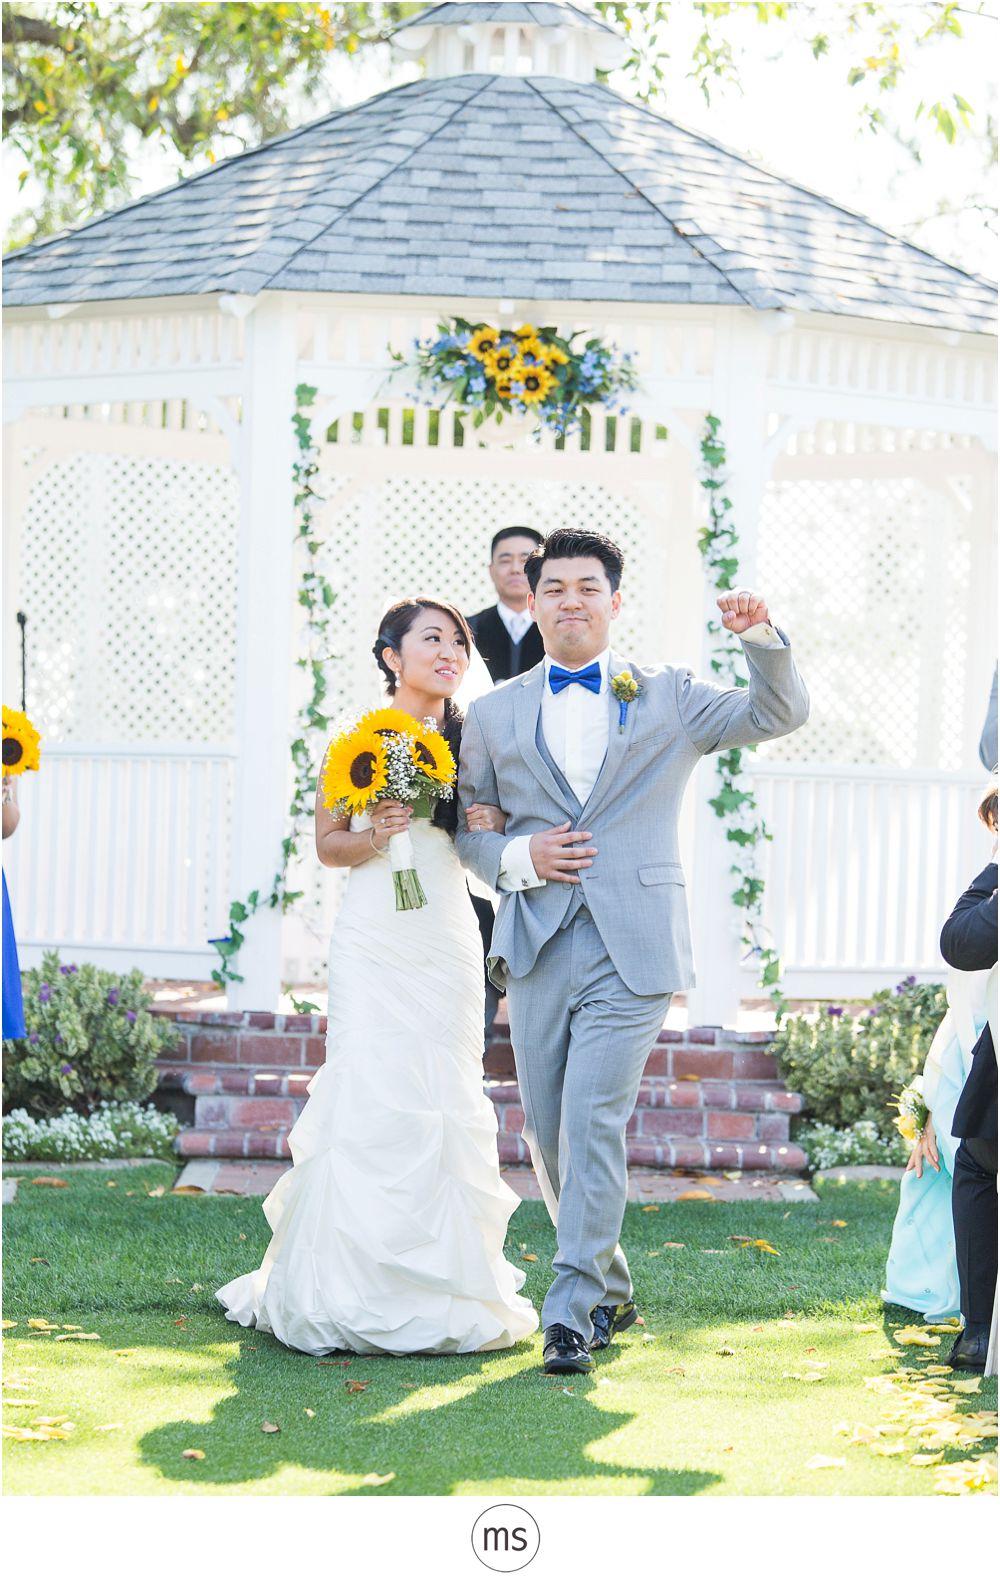 Charles & Sarah Alta Vista Country Club Placentia Wedding - Margarette Sia Photography_0065